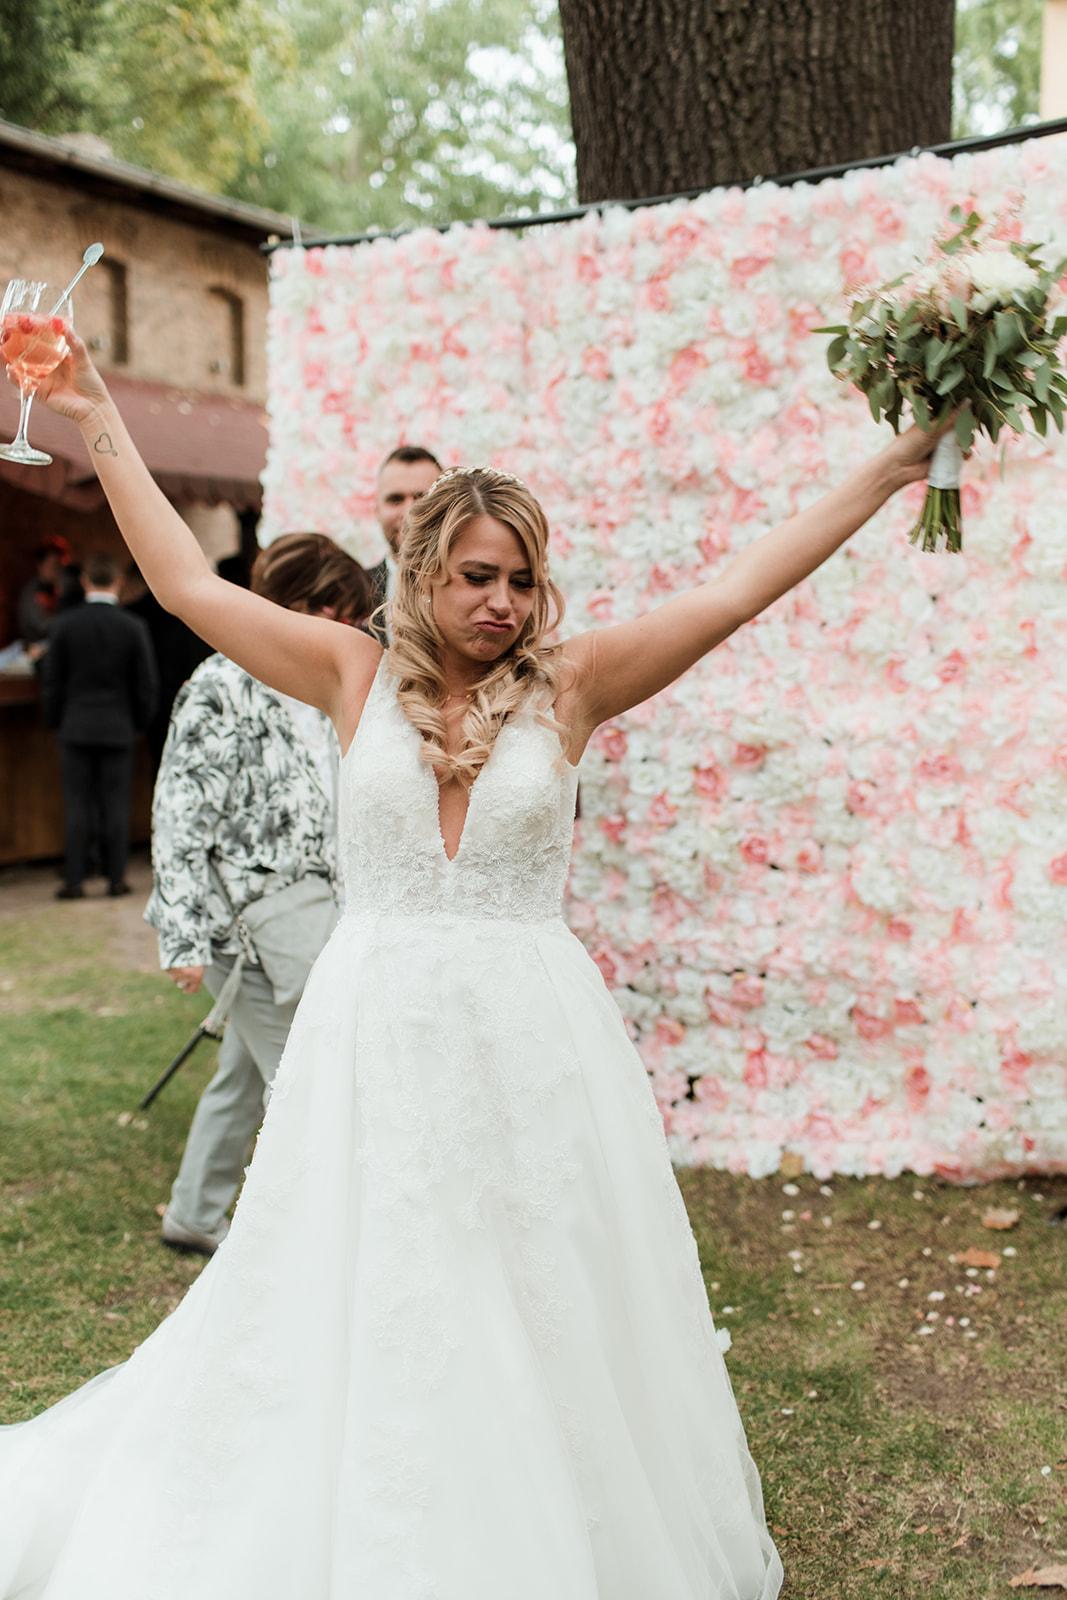 Jubelnde Braut